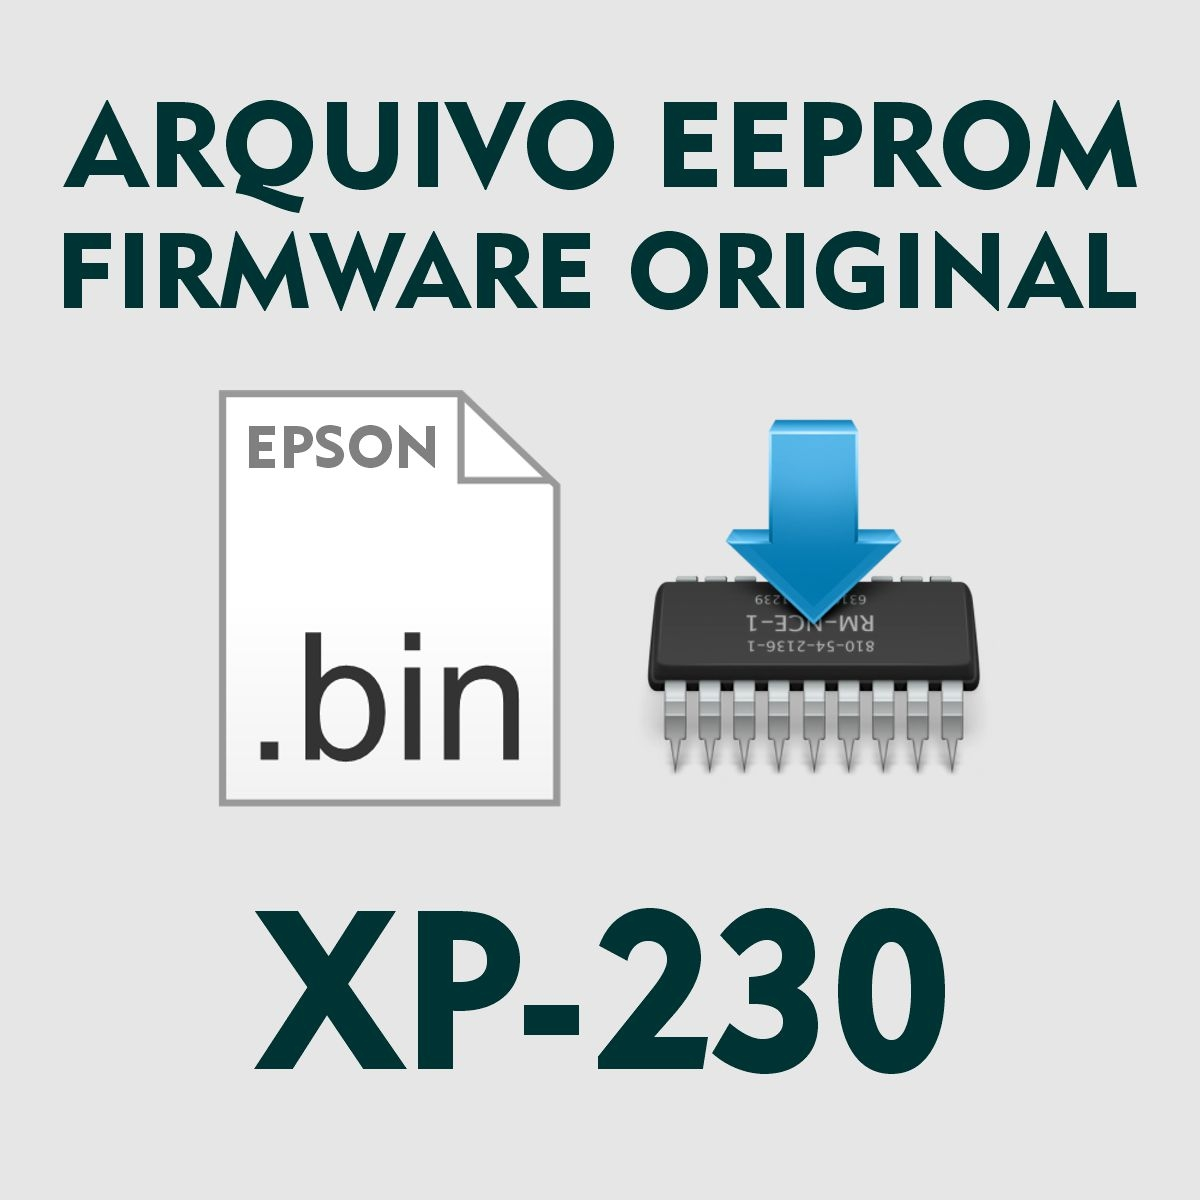 Epson XP-230   Arquivo de Eeprom Firmware .bin - Original